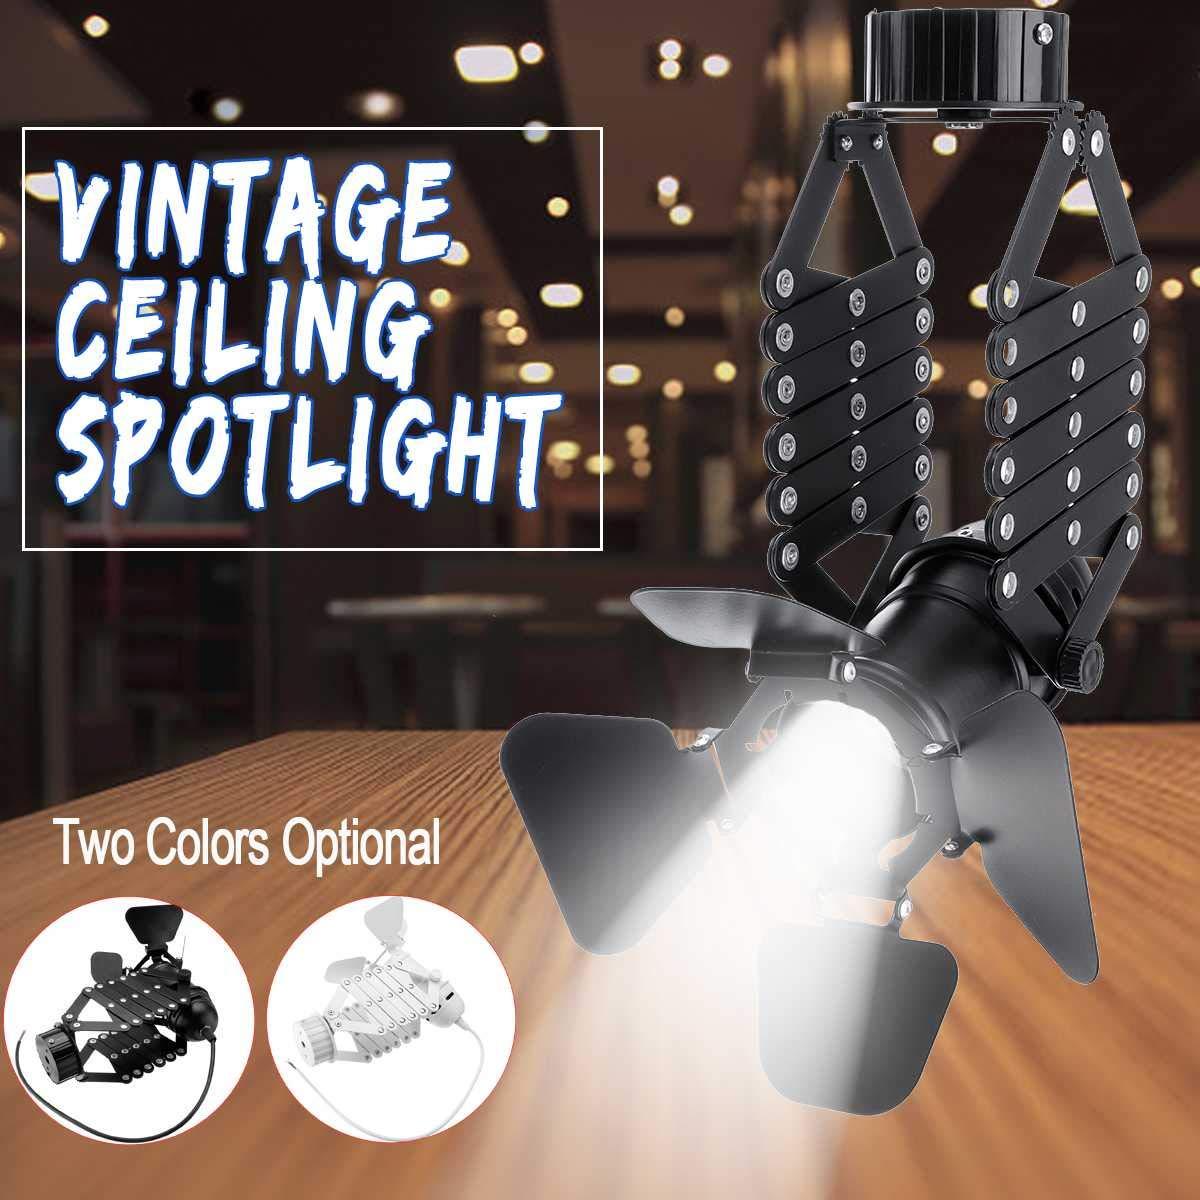 Bestchoice - 220V E27 110Lm Industrial Vintage Iron Track Pendant Ceiling Lamp Adjustable LED Spotlight White Black For 8-10 Square Meter